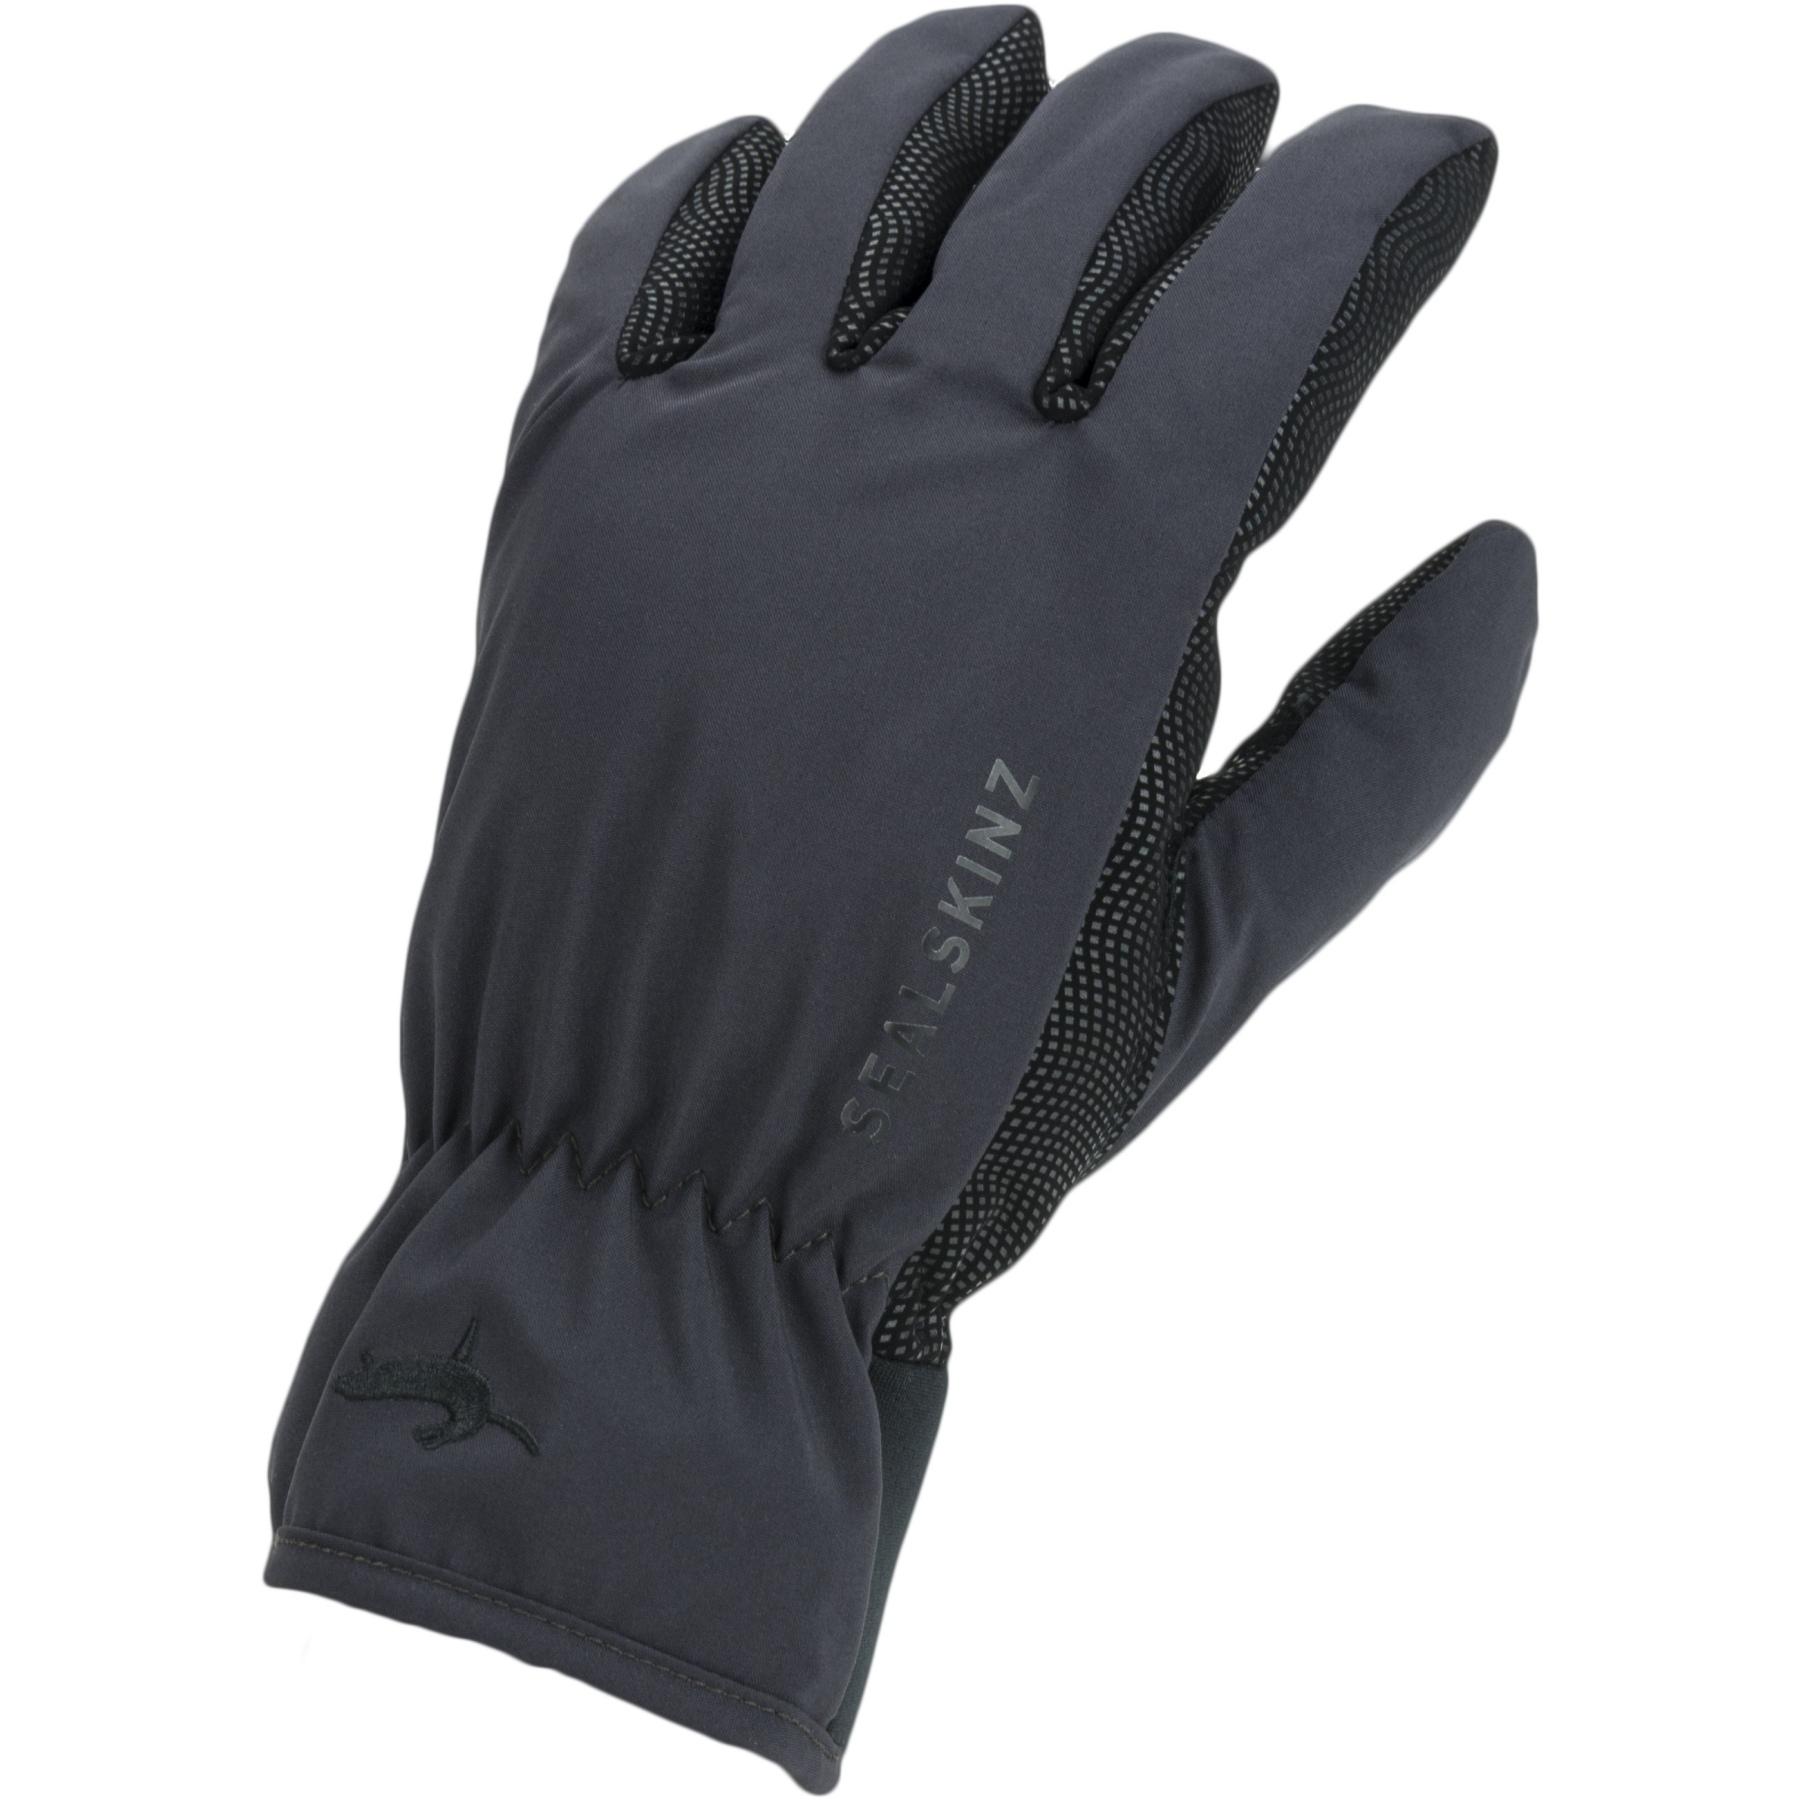 Foto de SealSkinz Waterproof All Weather Lightweight Guantes - Black